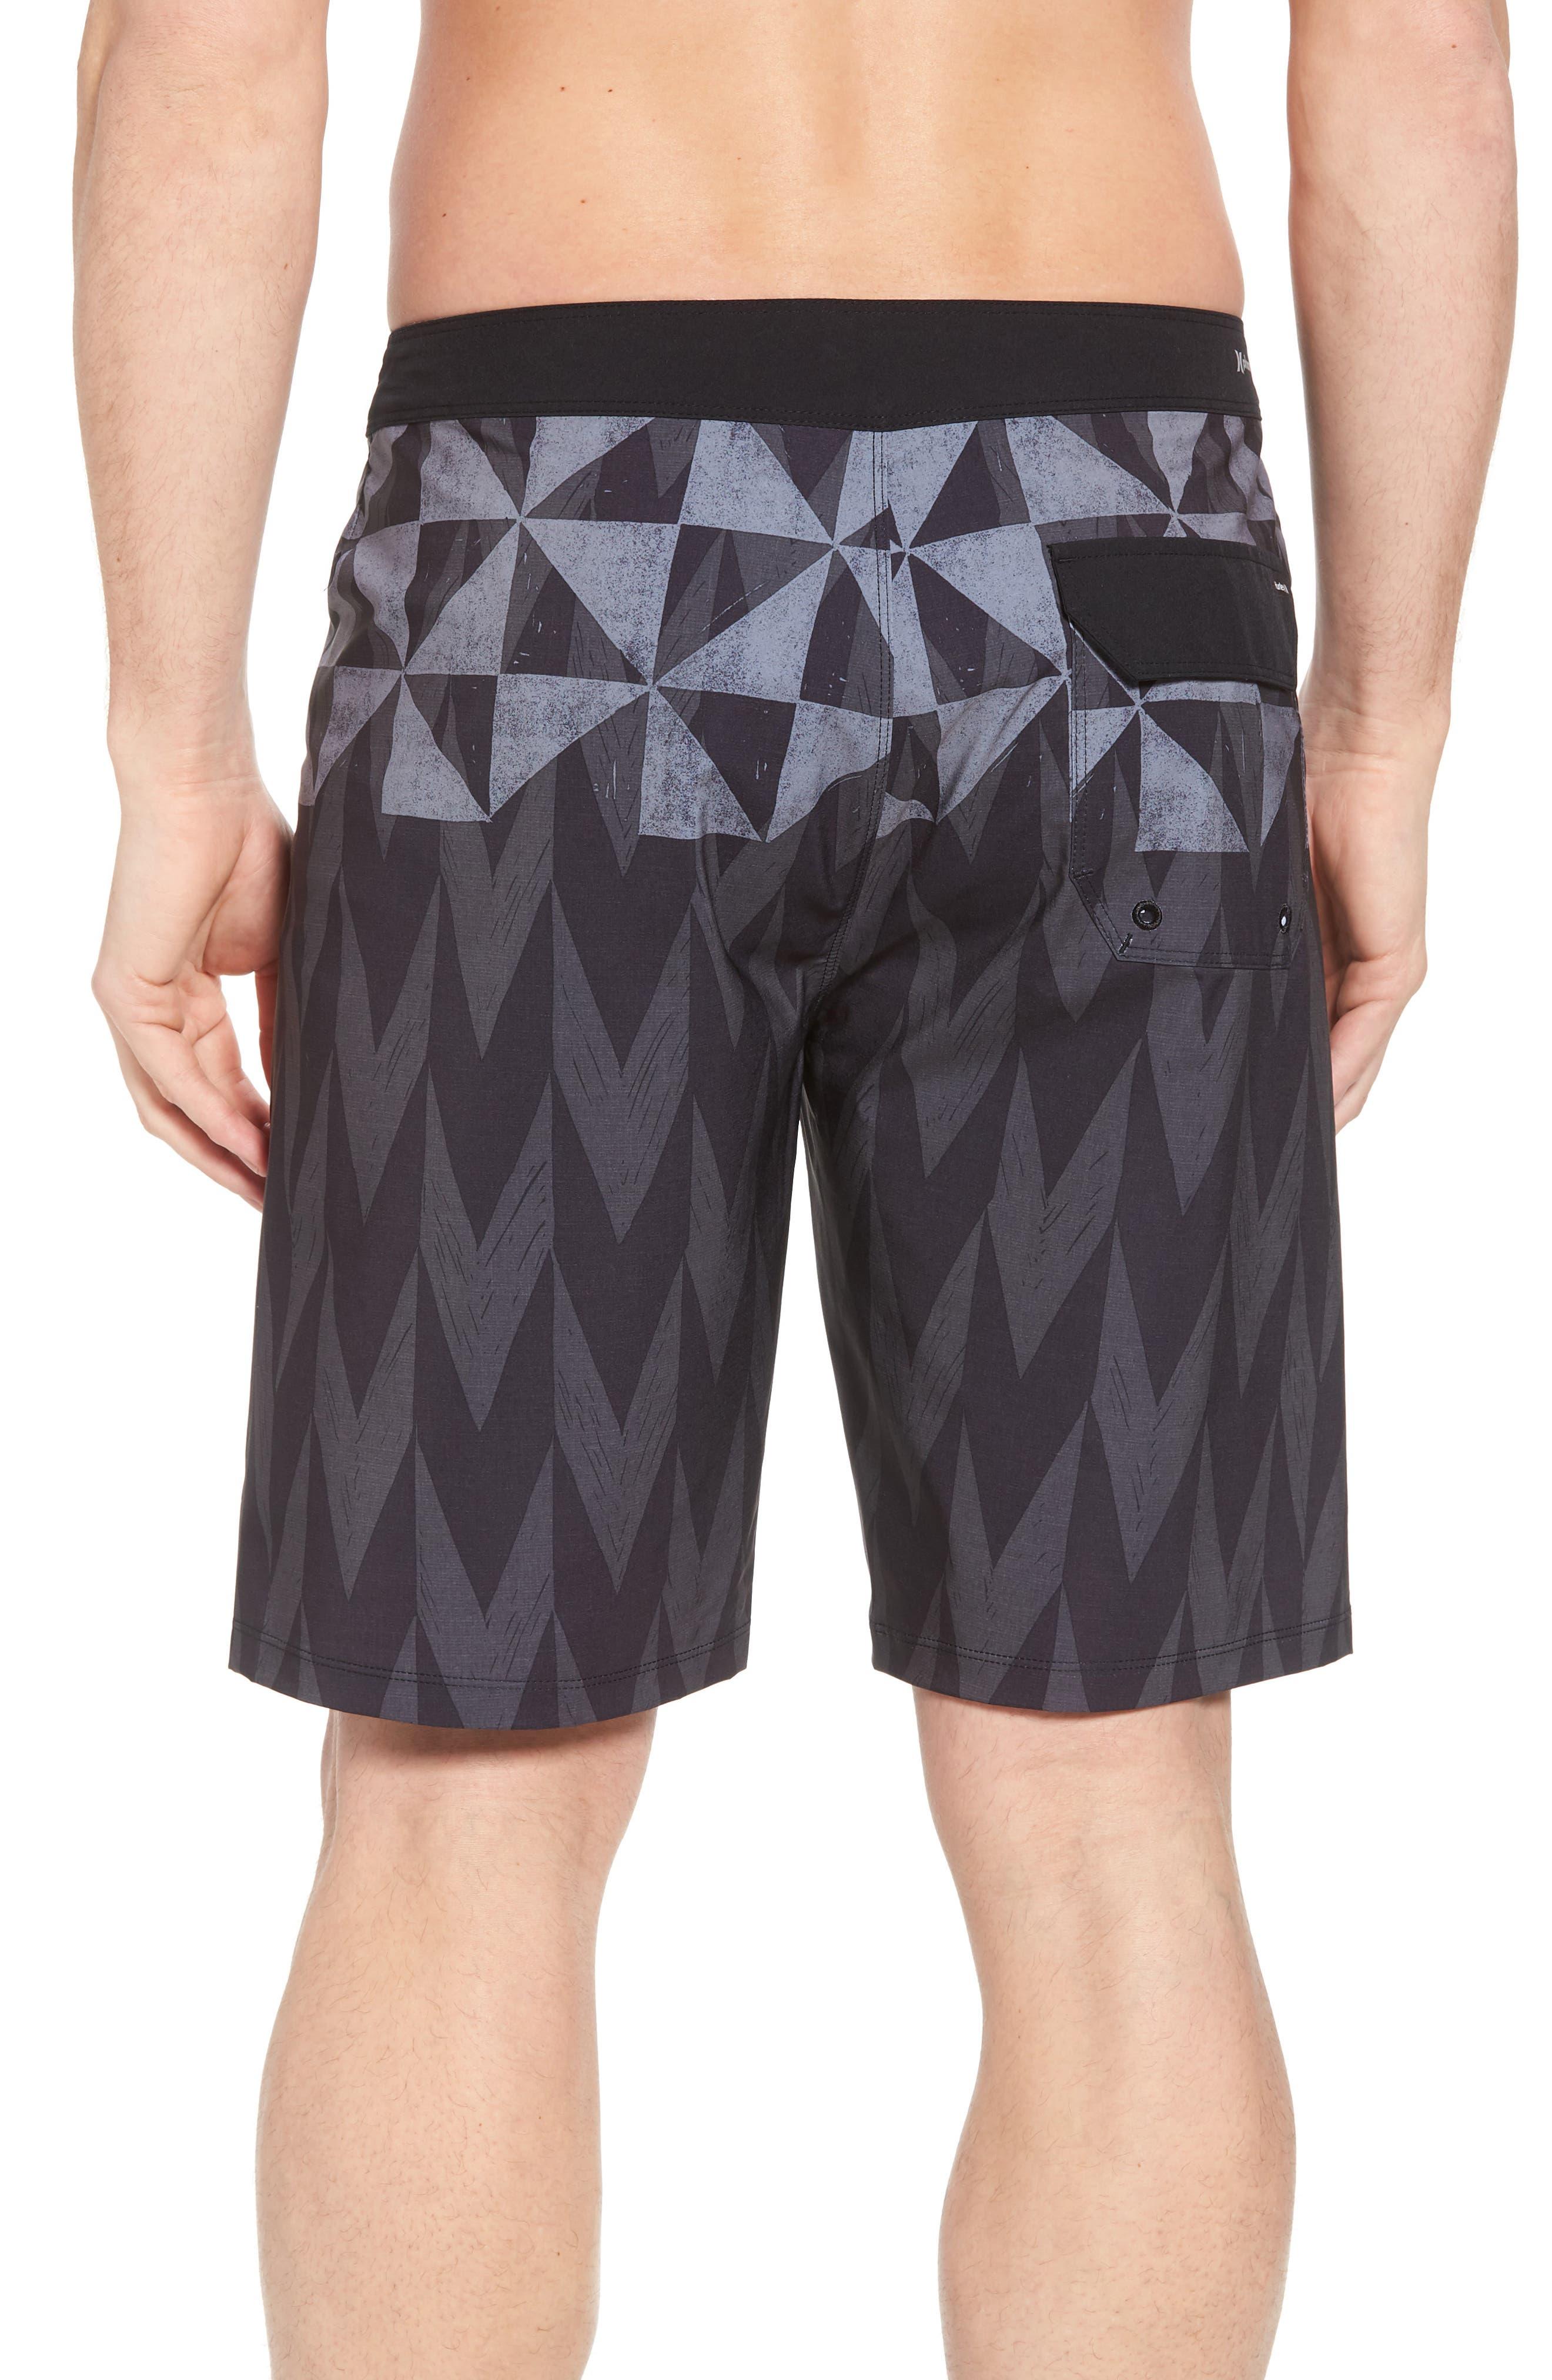 Phantom Bula Board Shorts,                             Alternate thumbnail 2, color,                             Black